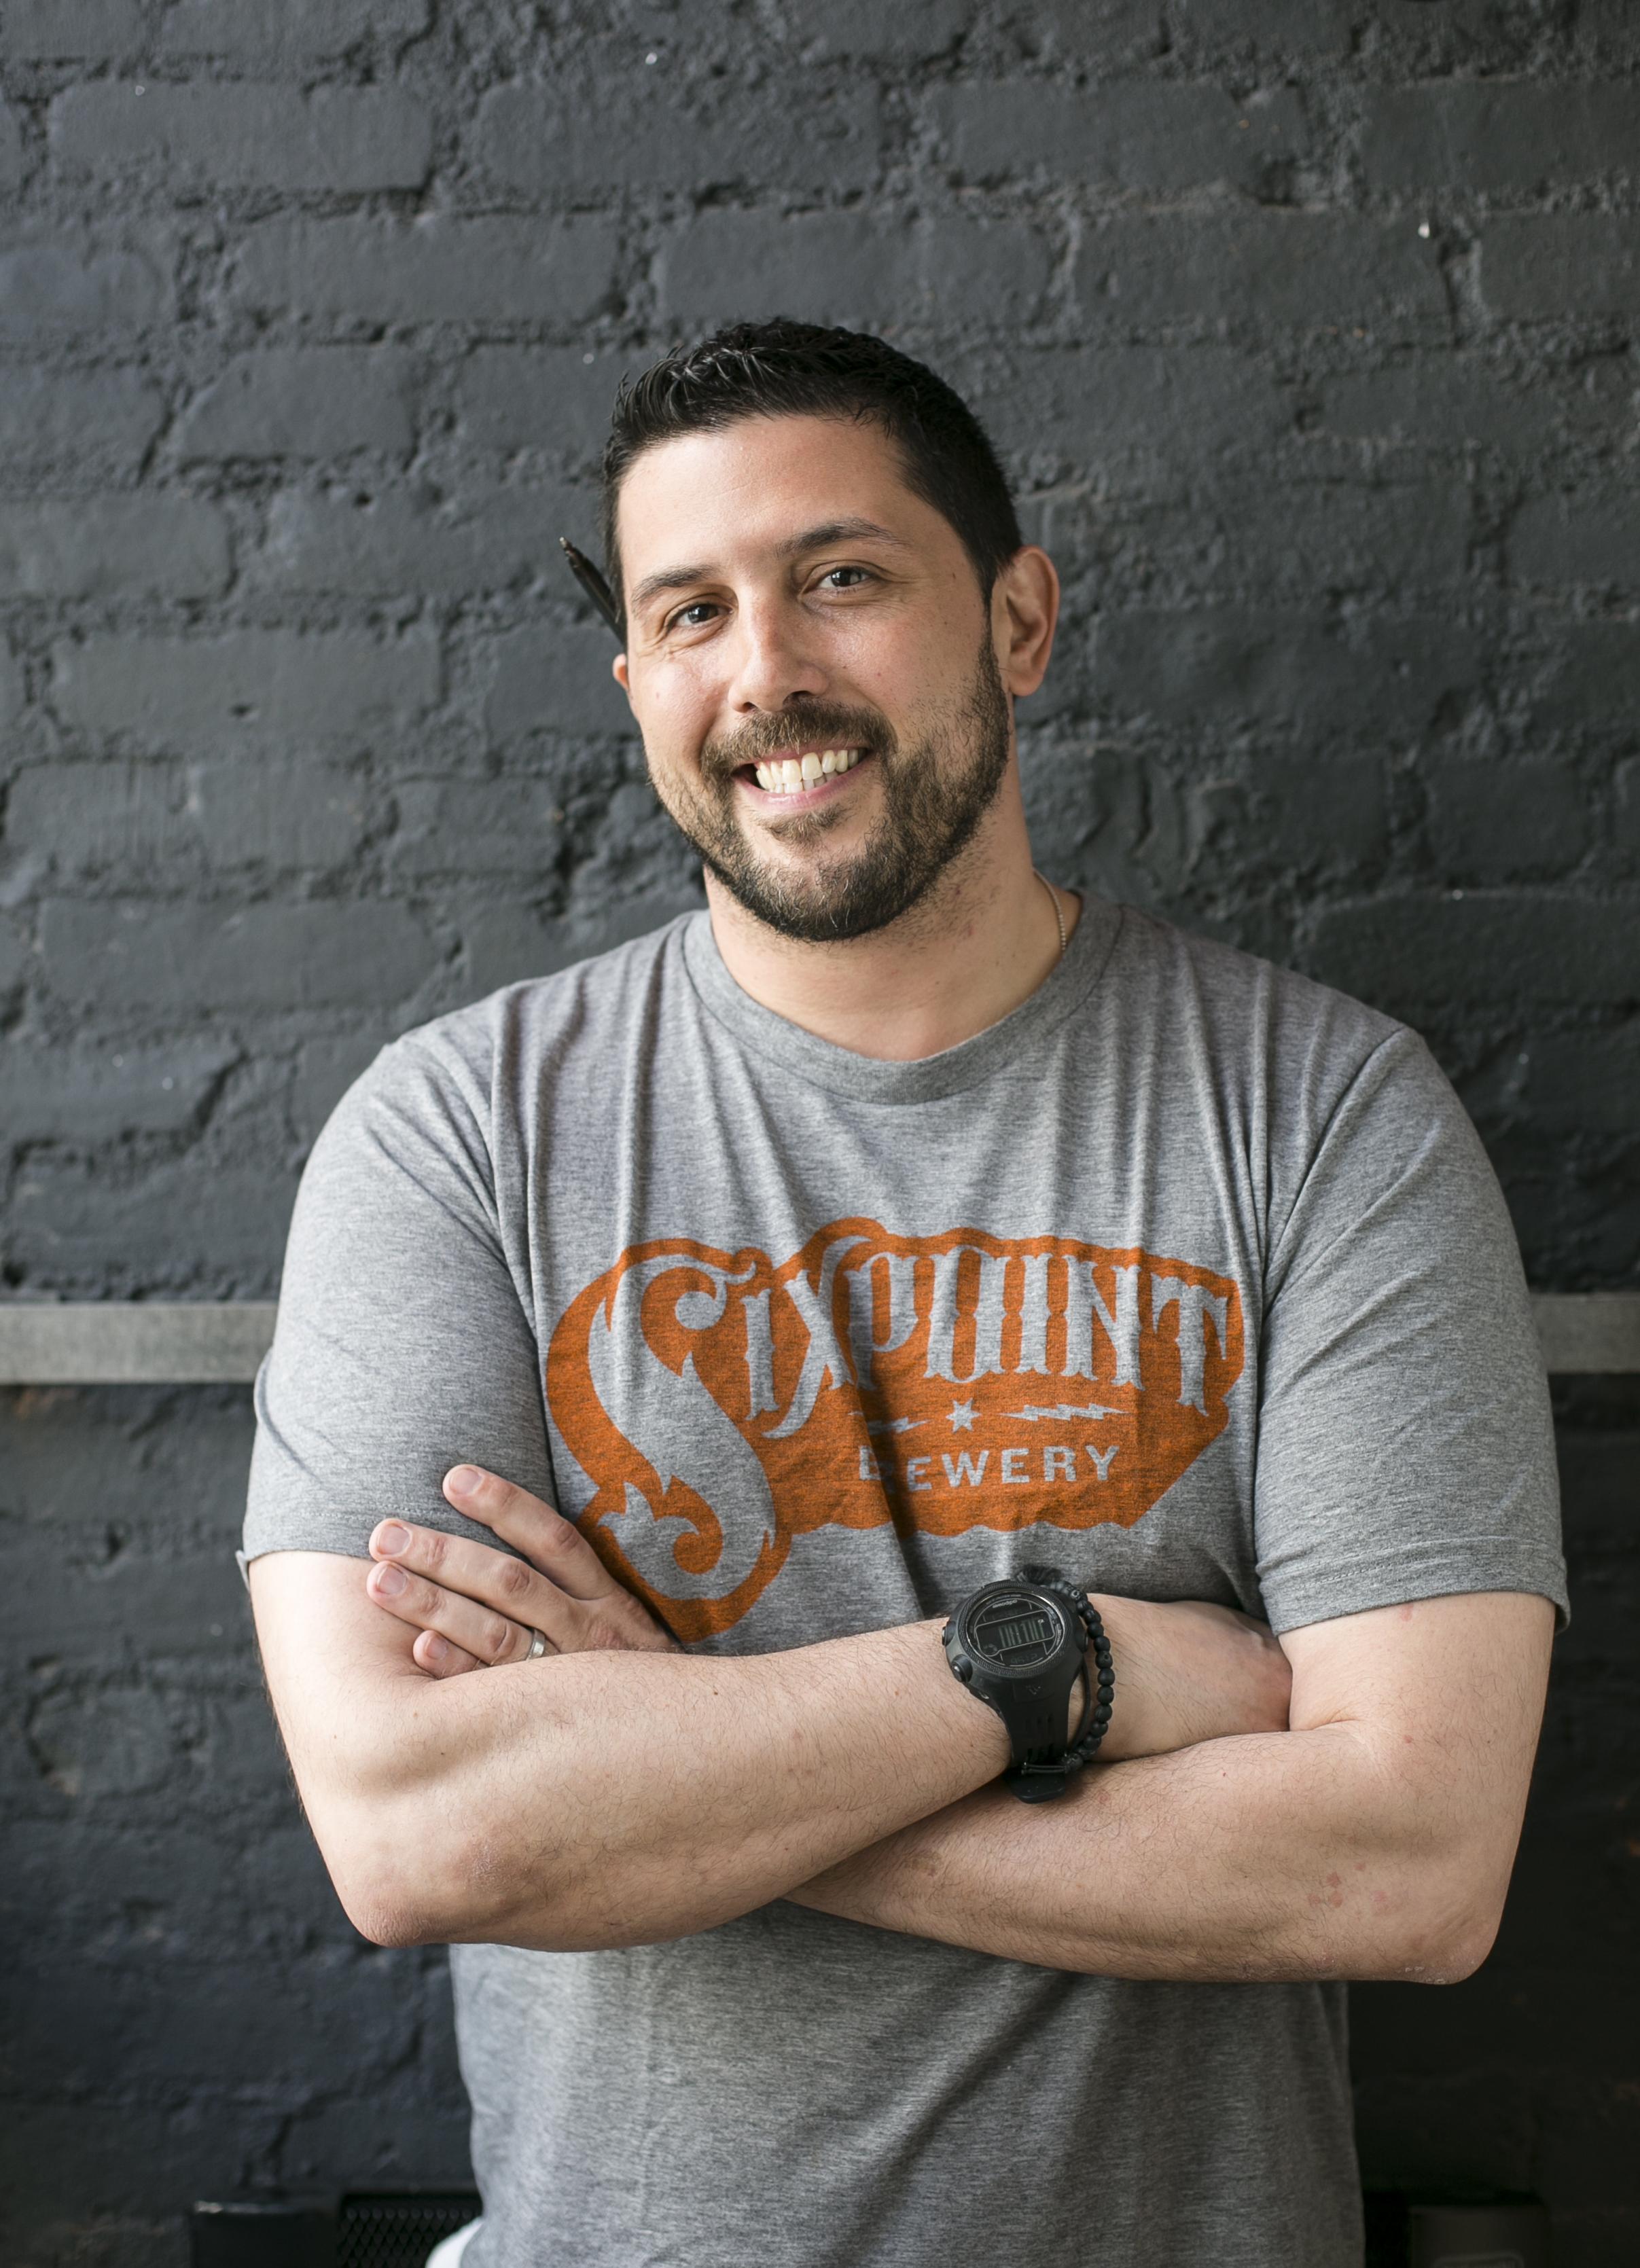 Black Tap owner and chef Joe Isidori. (Samira Bouaou/Epoch Times)